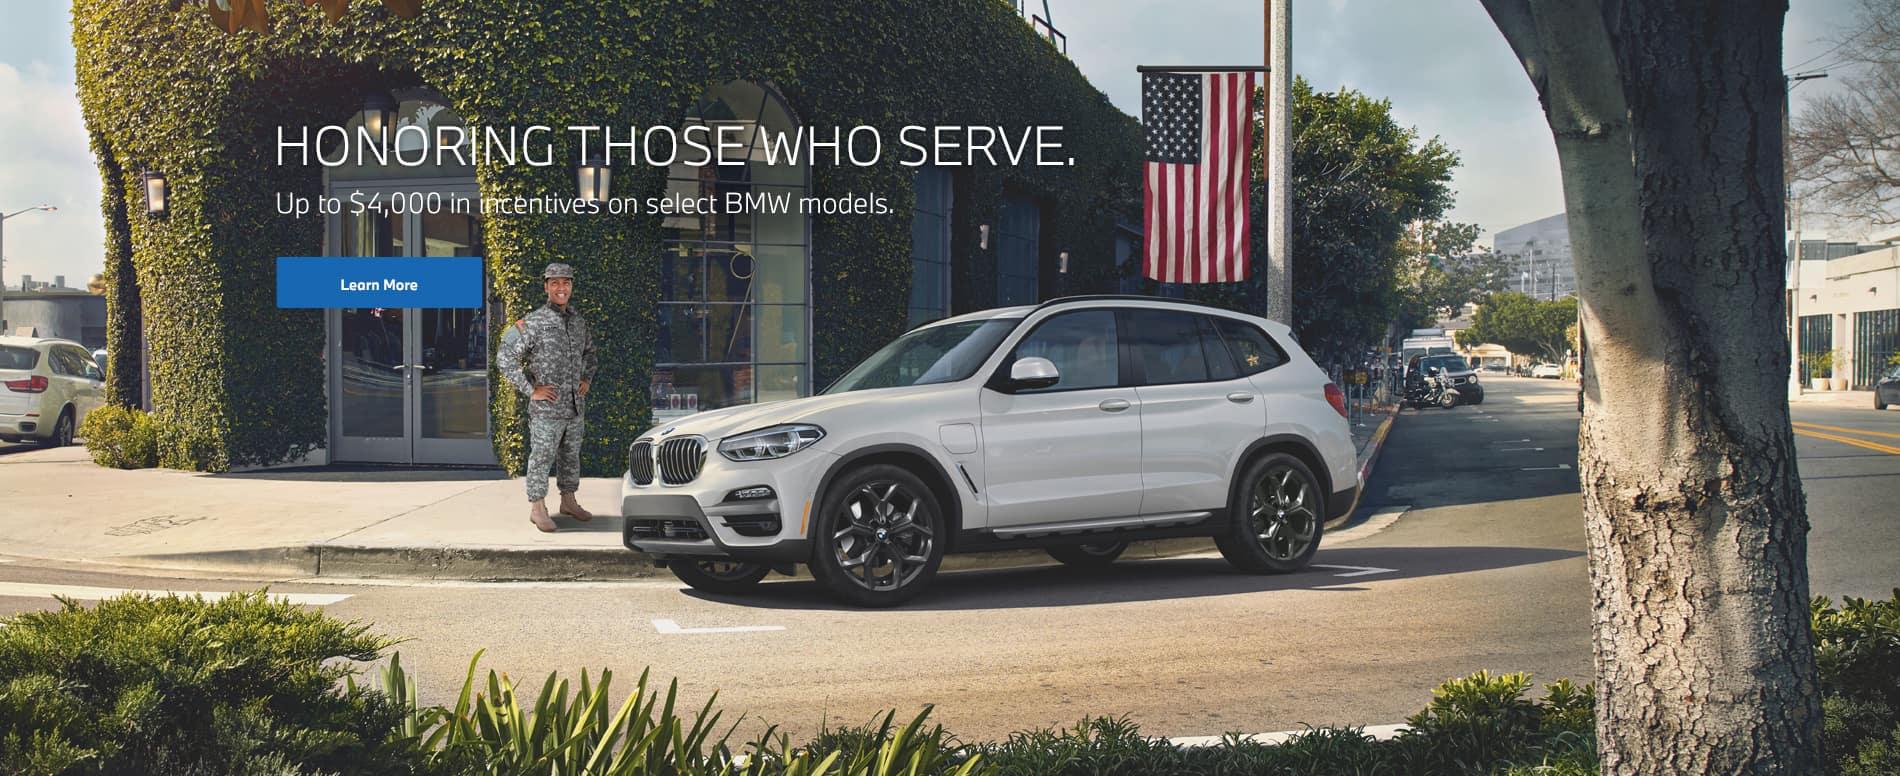 BMW_SUV_USAA20_FMA_1900x776